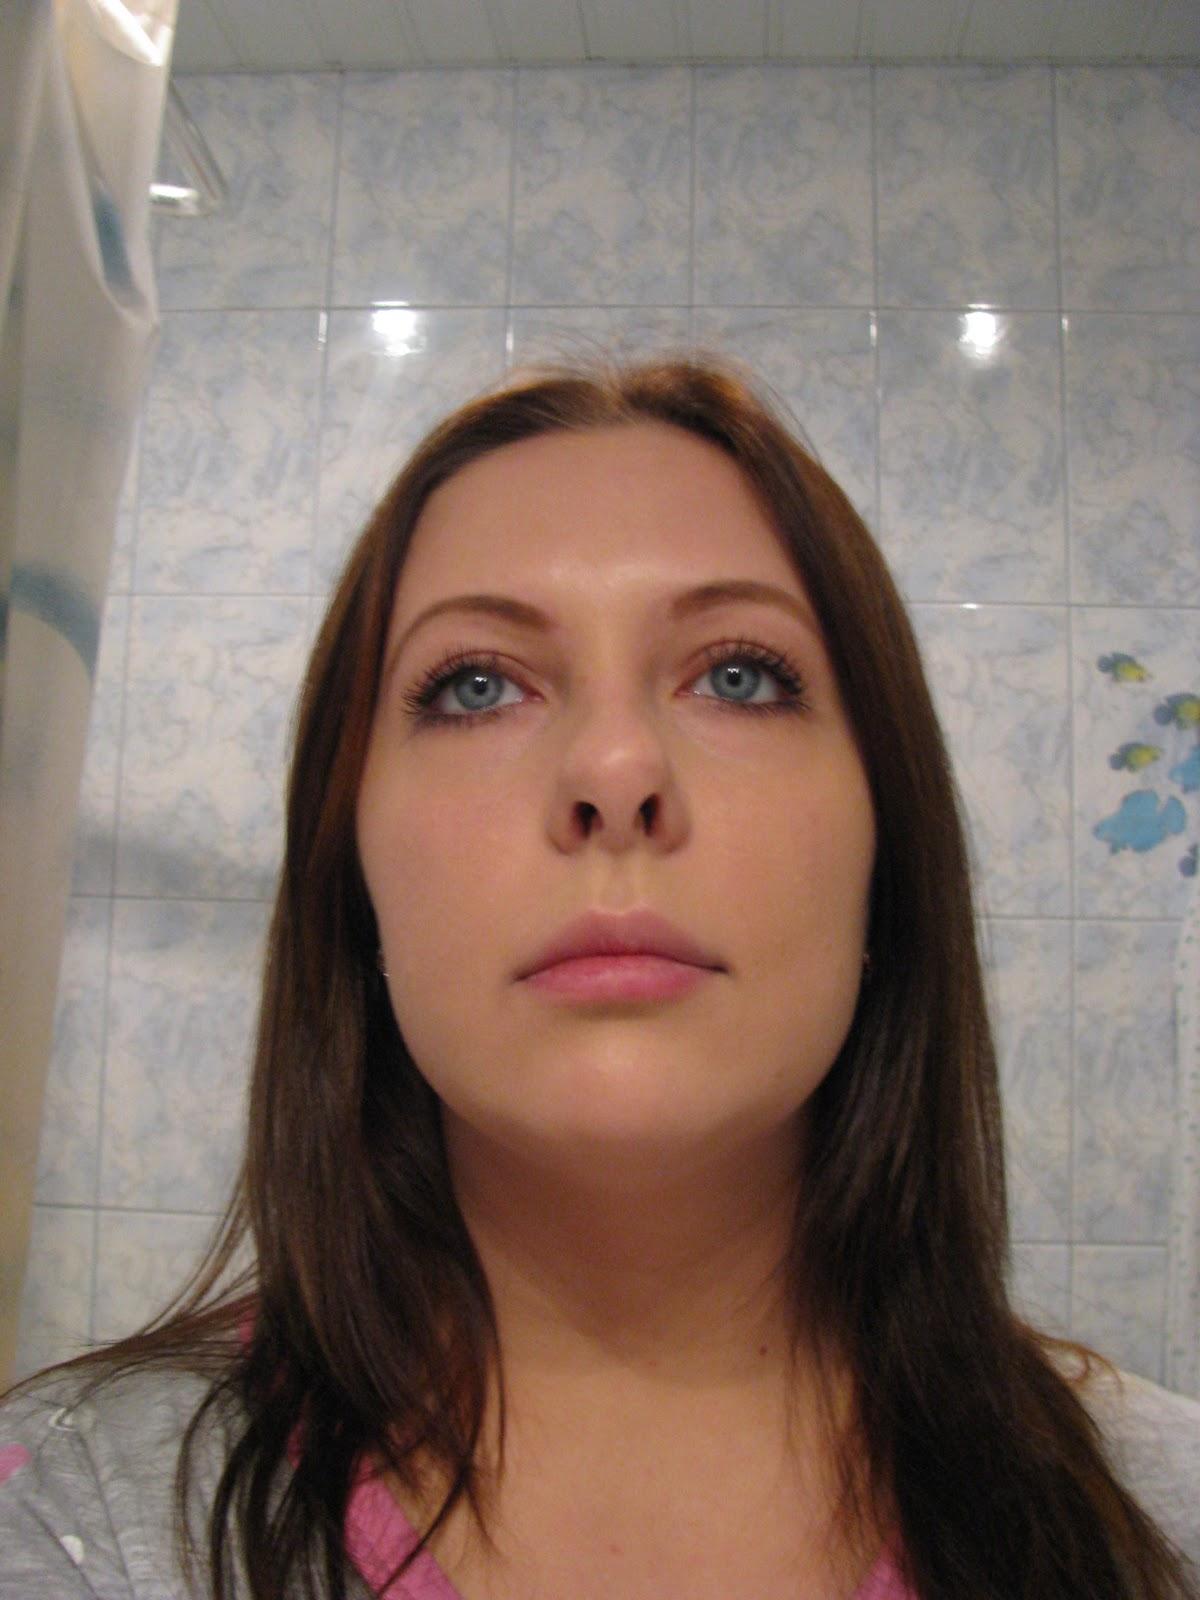 Макияж для кривого носа фото